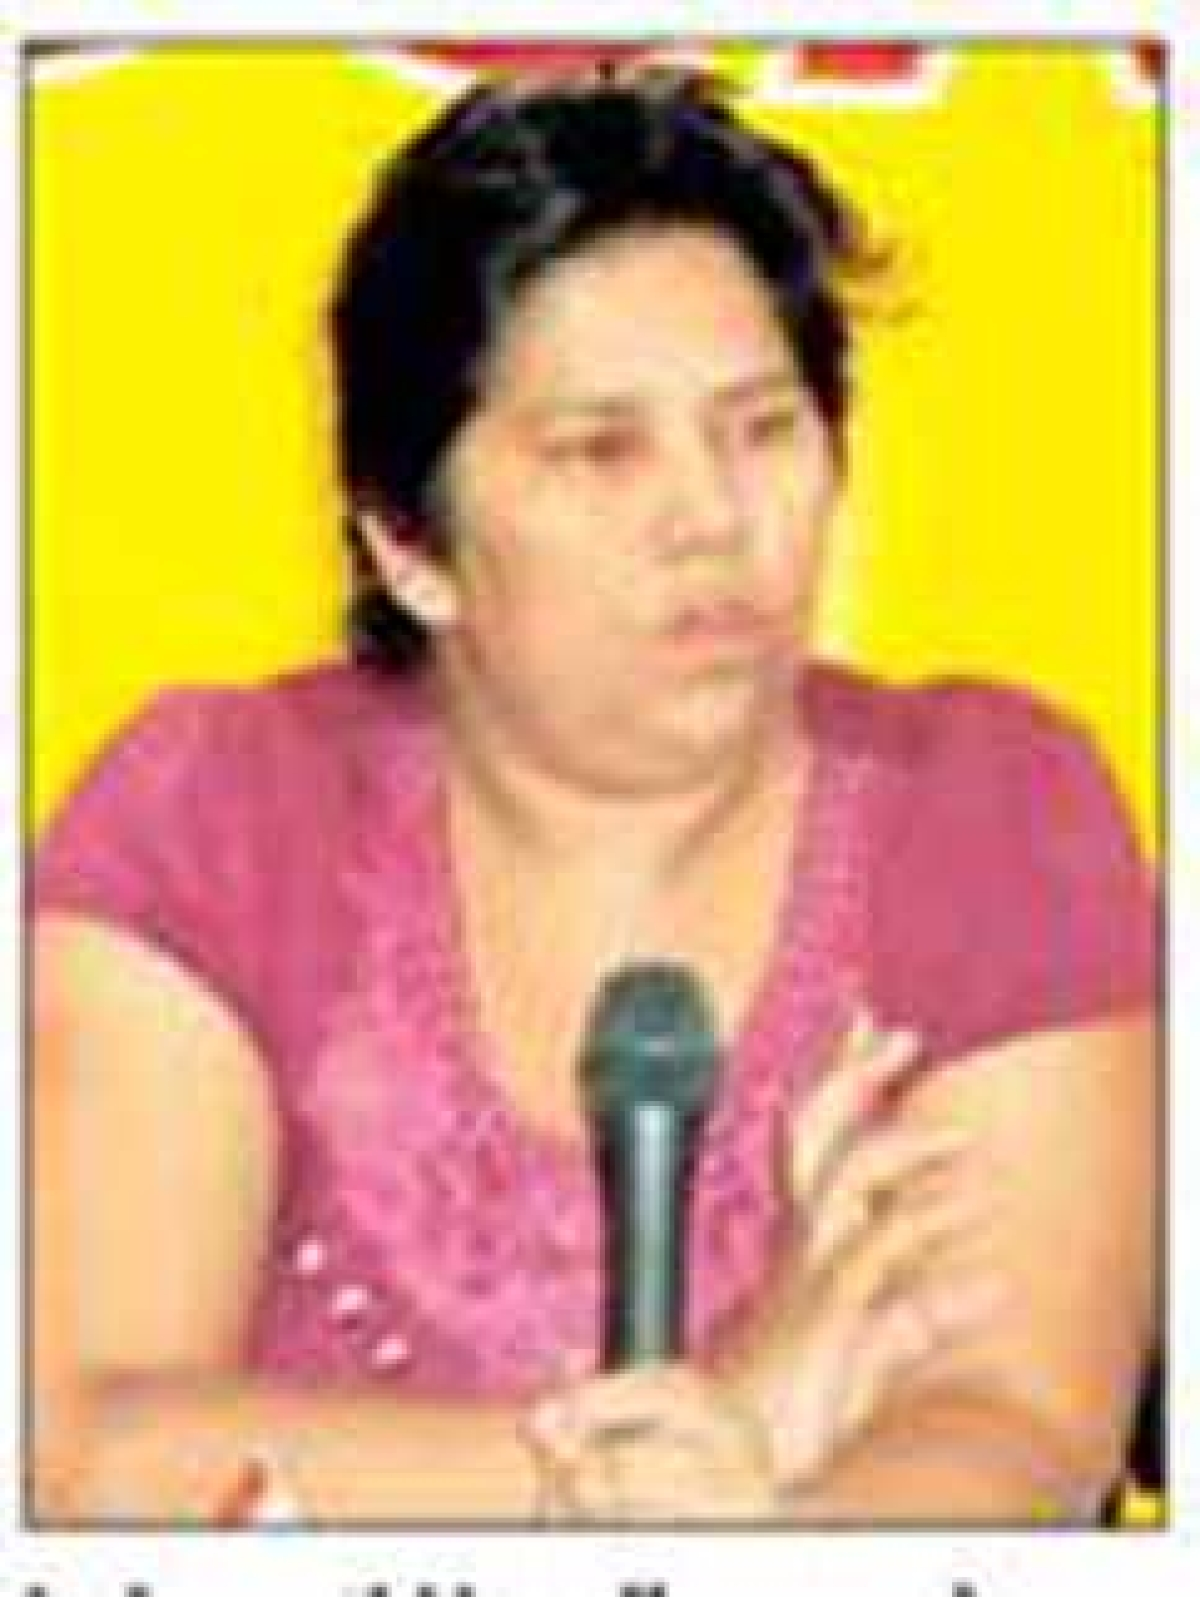 Woman accuses Bhargava of sexual exploitation